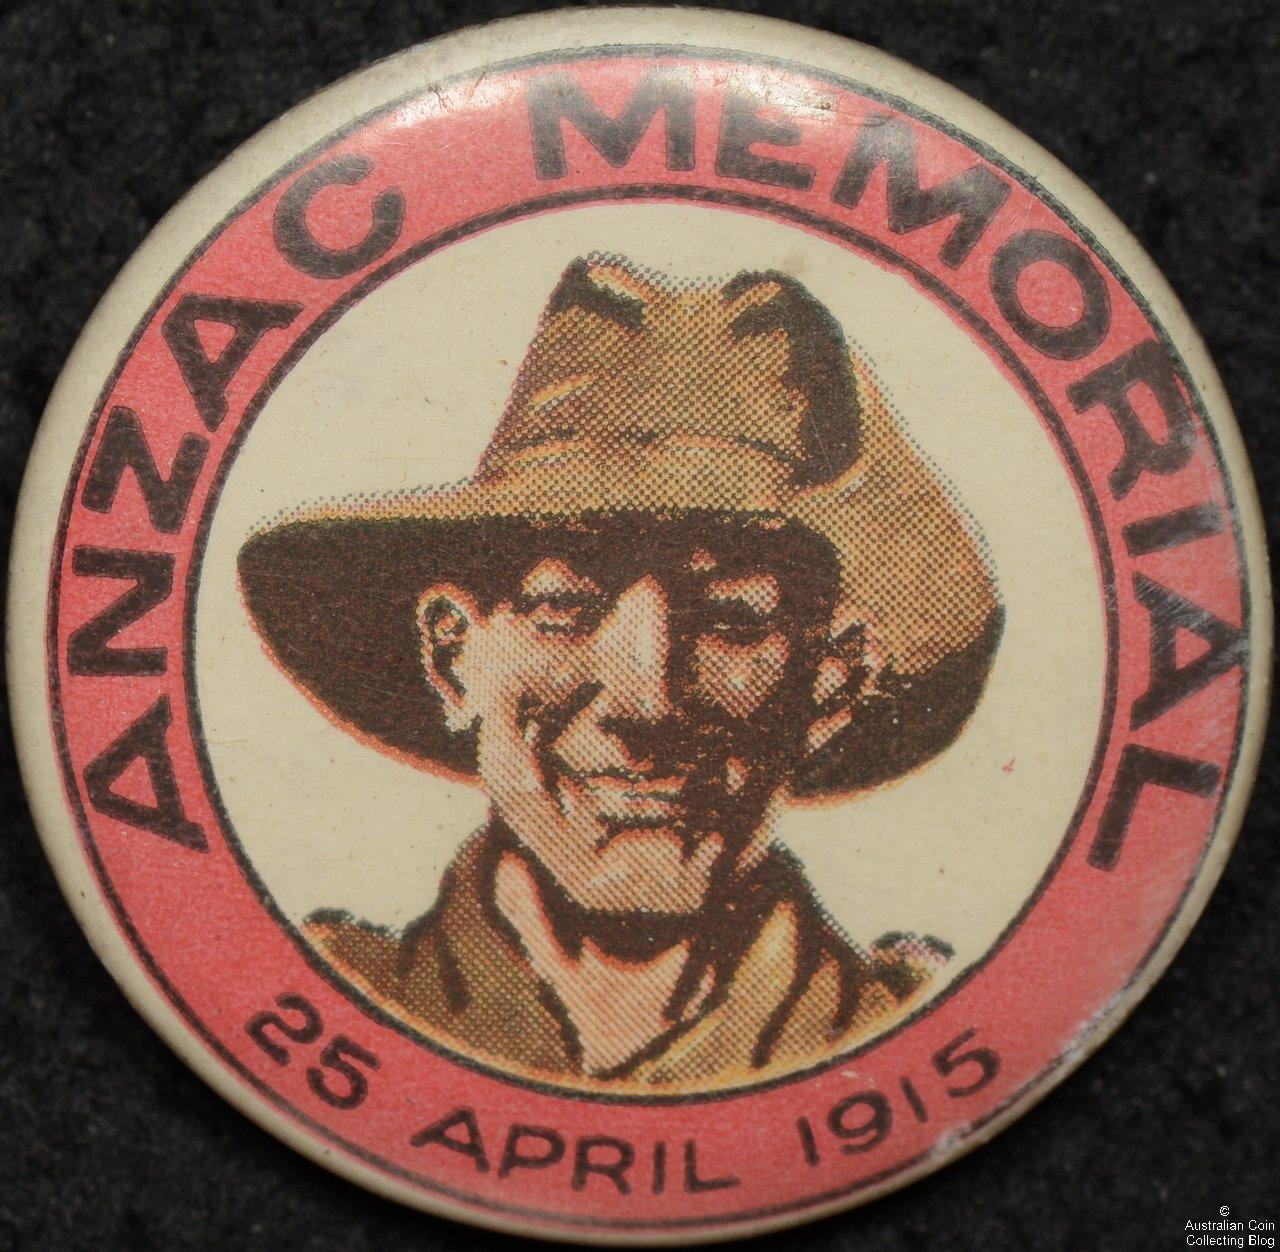 ANZAC Memorial 25 April 1915 Tin Badge